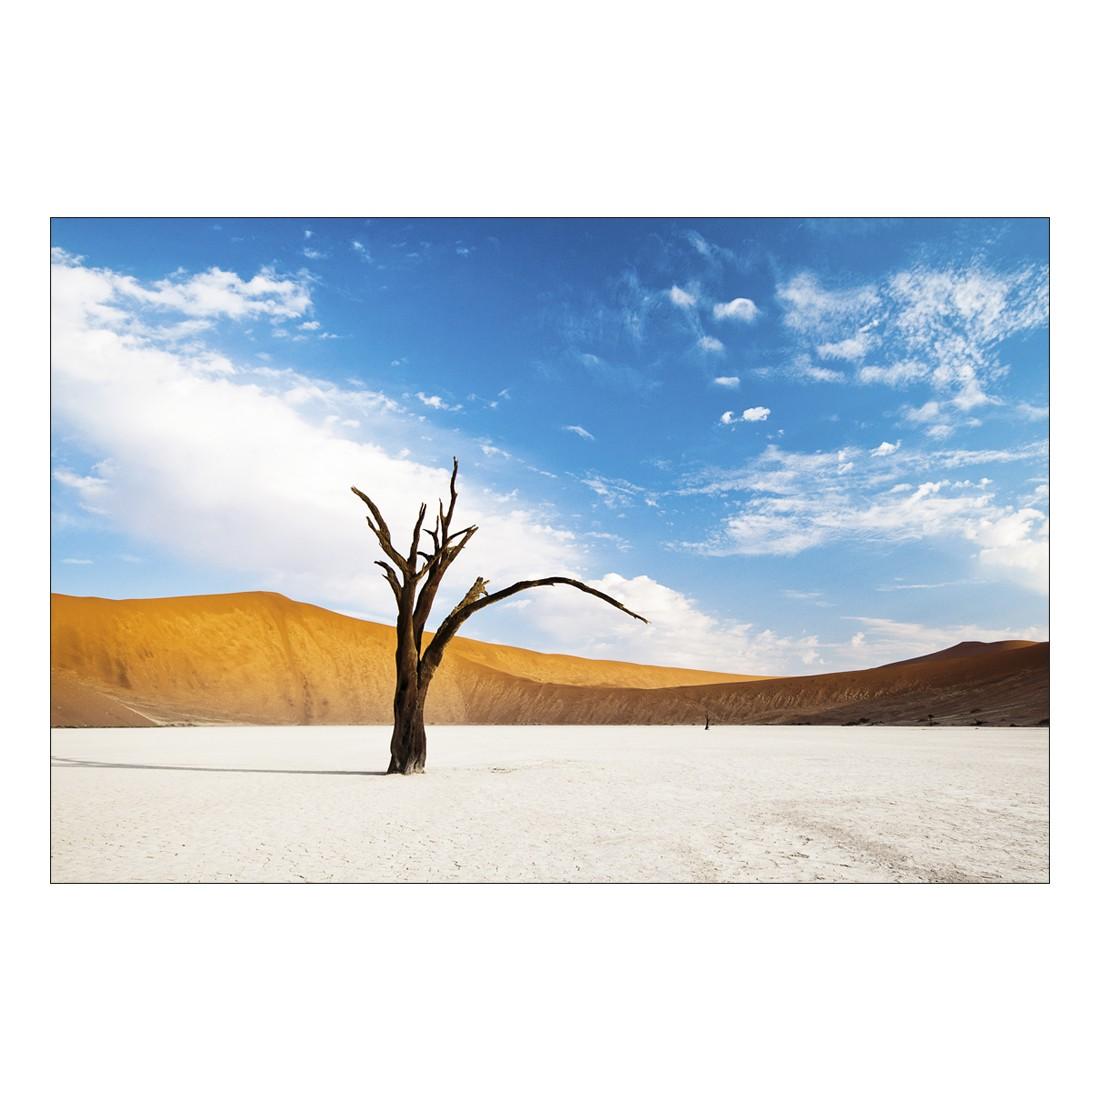 Leinwandbild DEAD DESERT TREE – Abmessung 100 x 50 cm, Gallery of Innovative Art kaufen